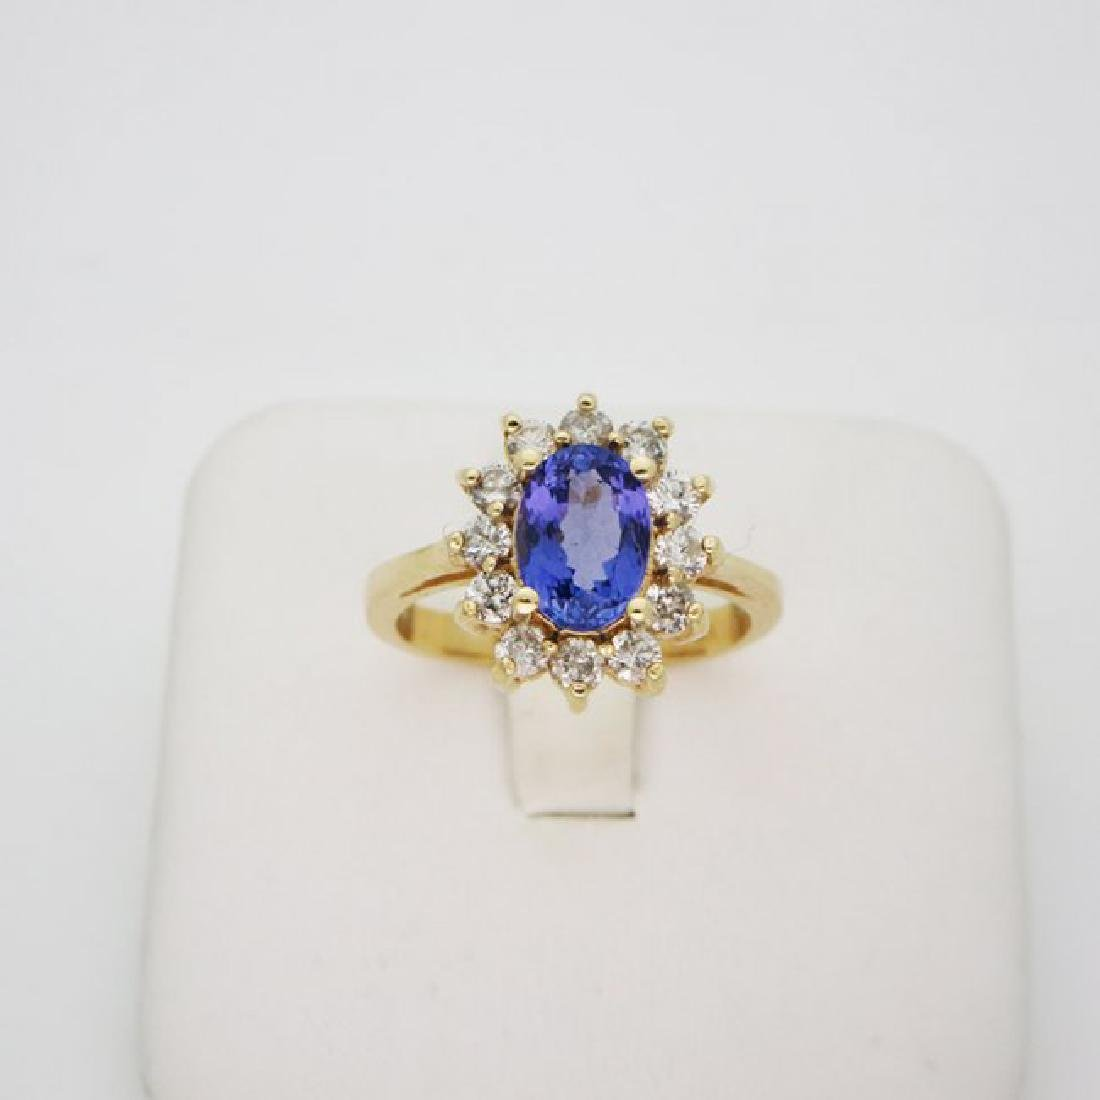 14K YELLOW GOLD & DIAMOND RING SIZE 6.5